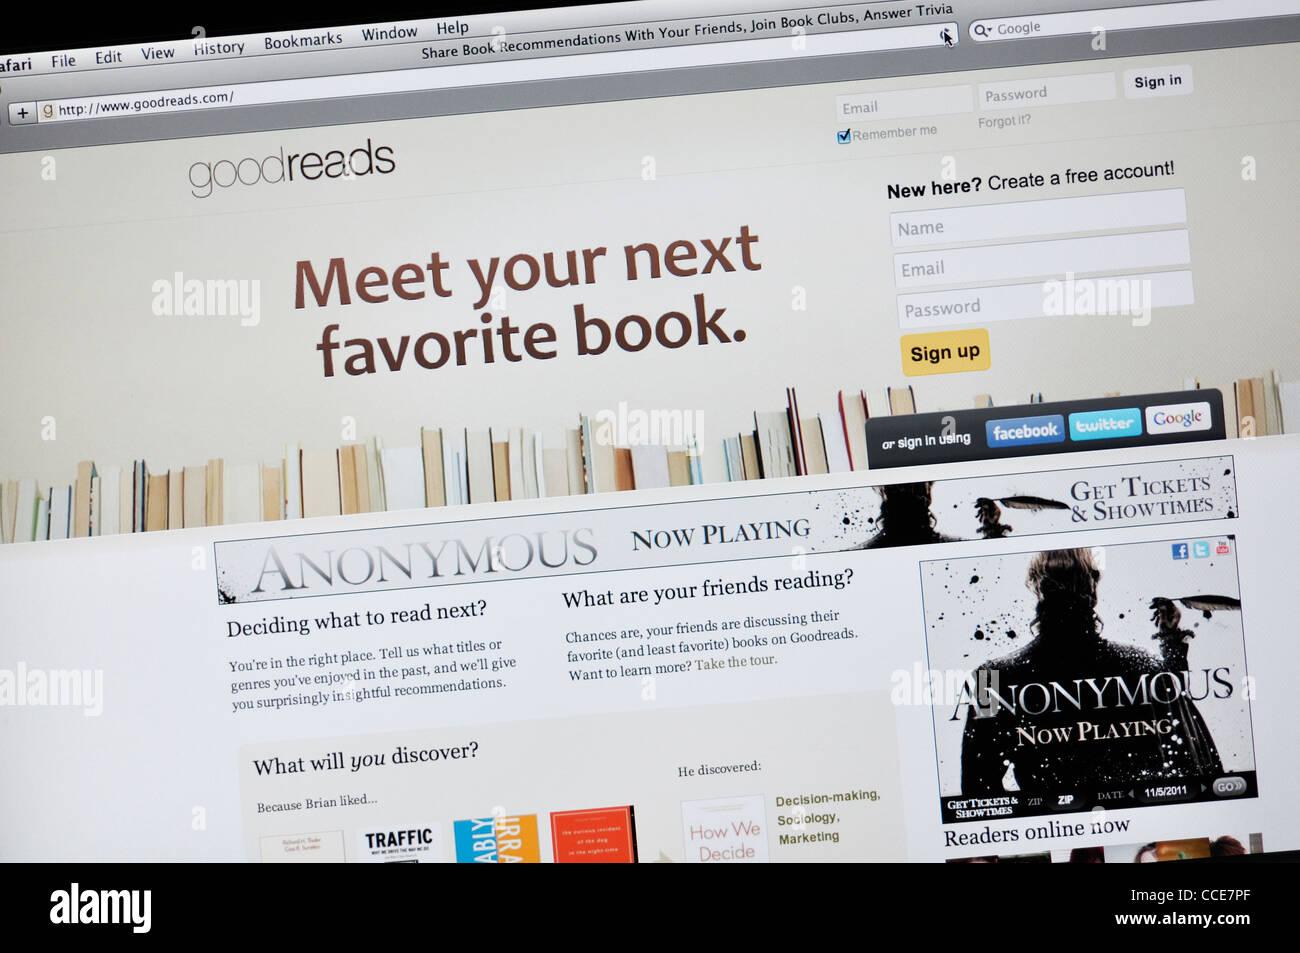 Goodreads com - book cataloging website Stock Photo